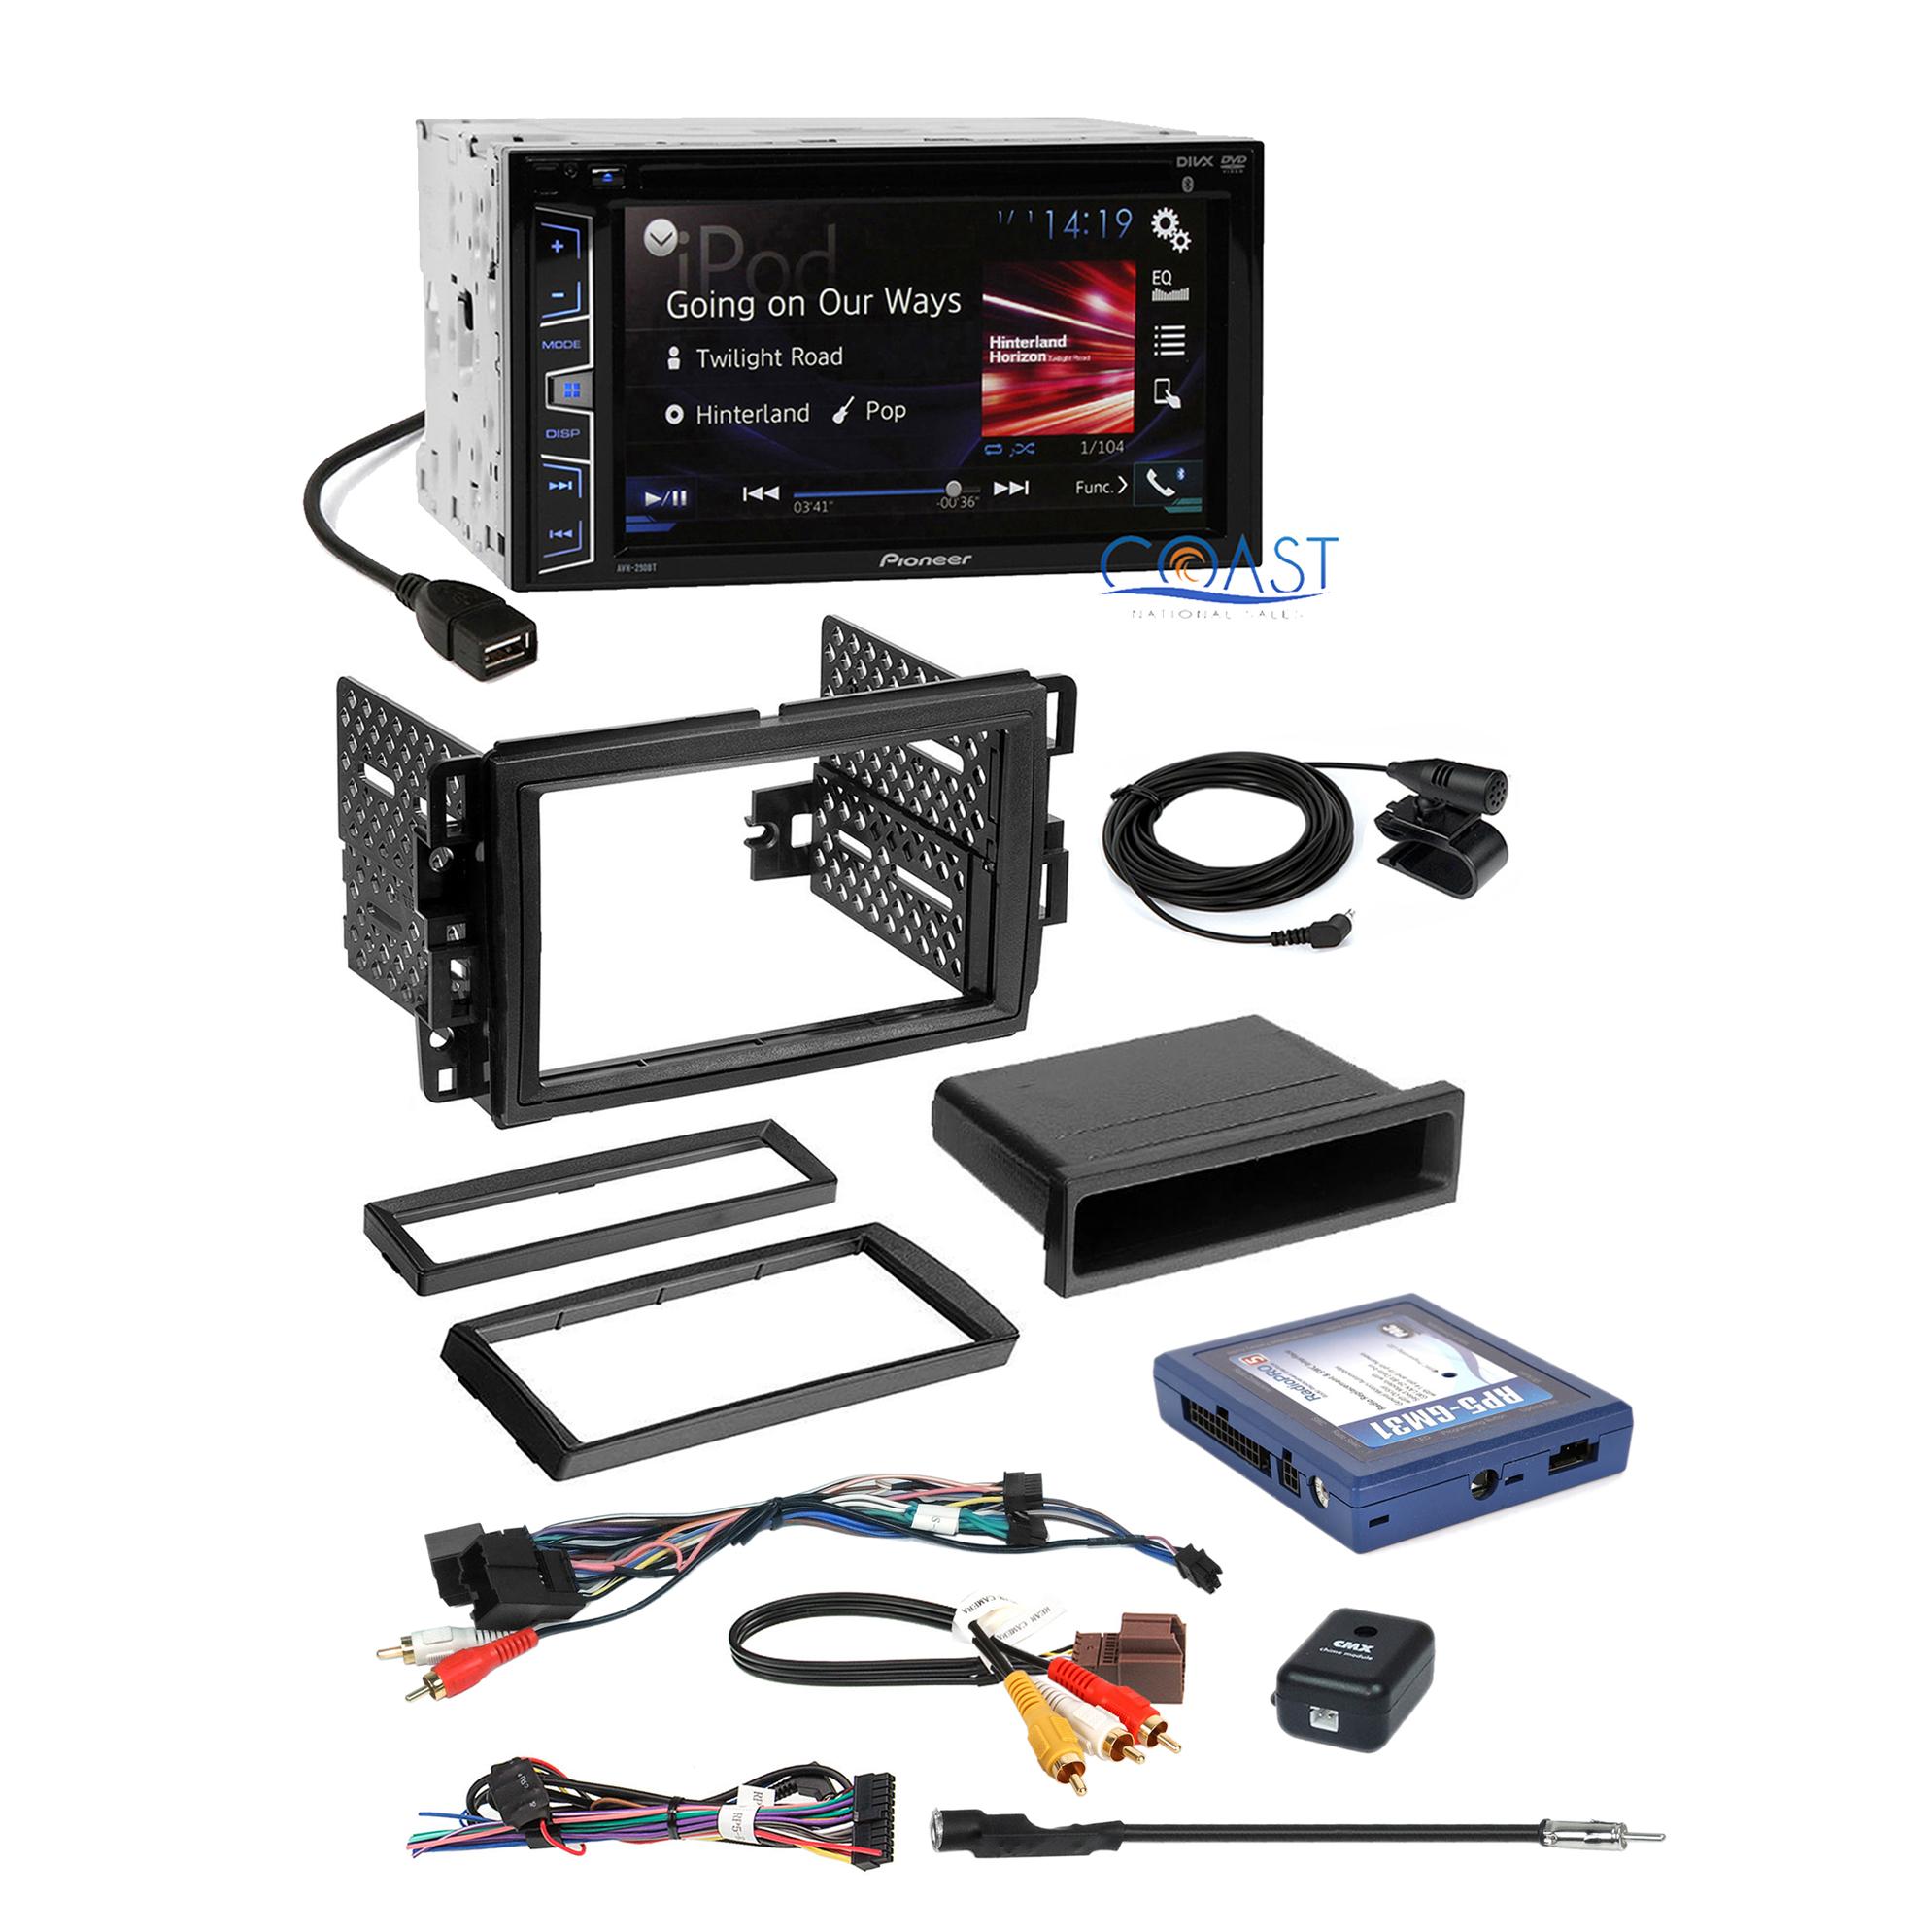 Pioneer radio stereo gm dash kit harness w onstar